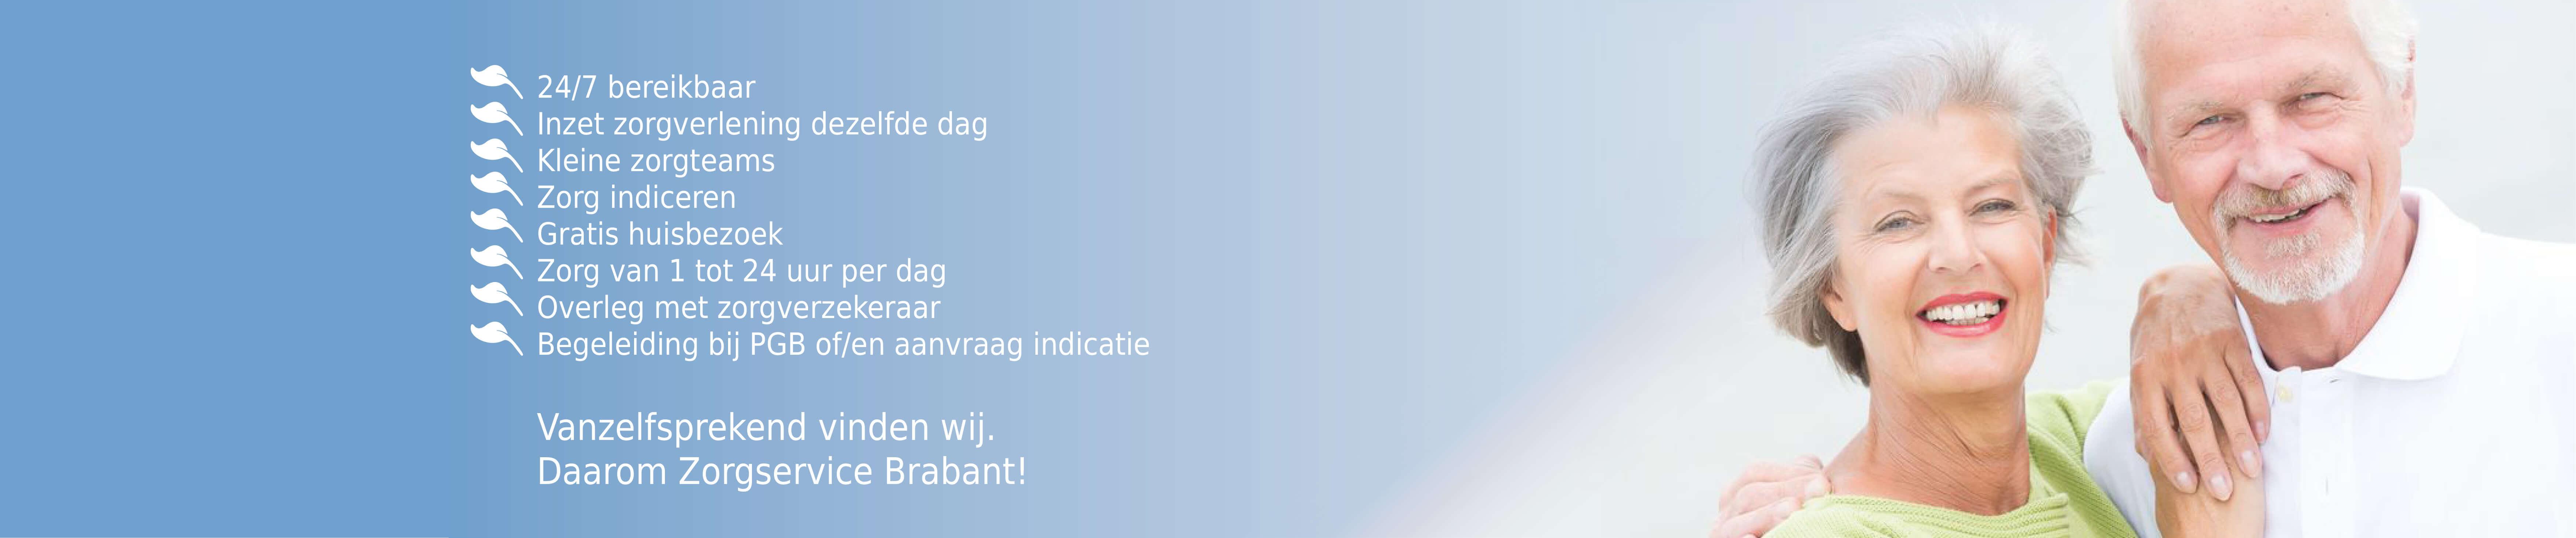 Zorgservice Brabant website3